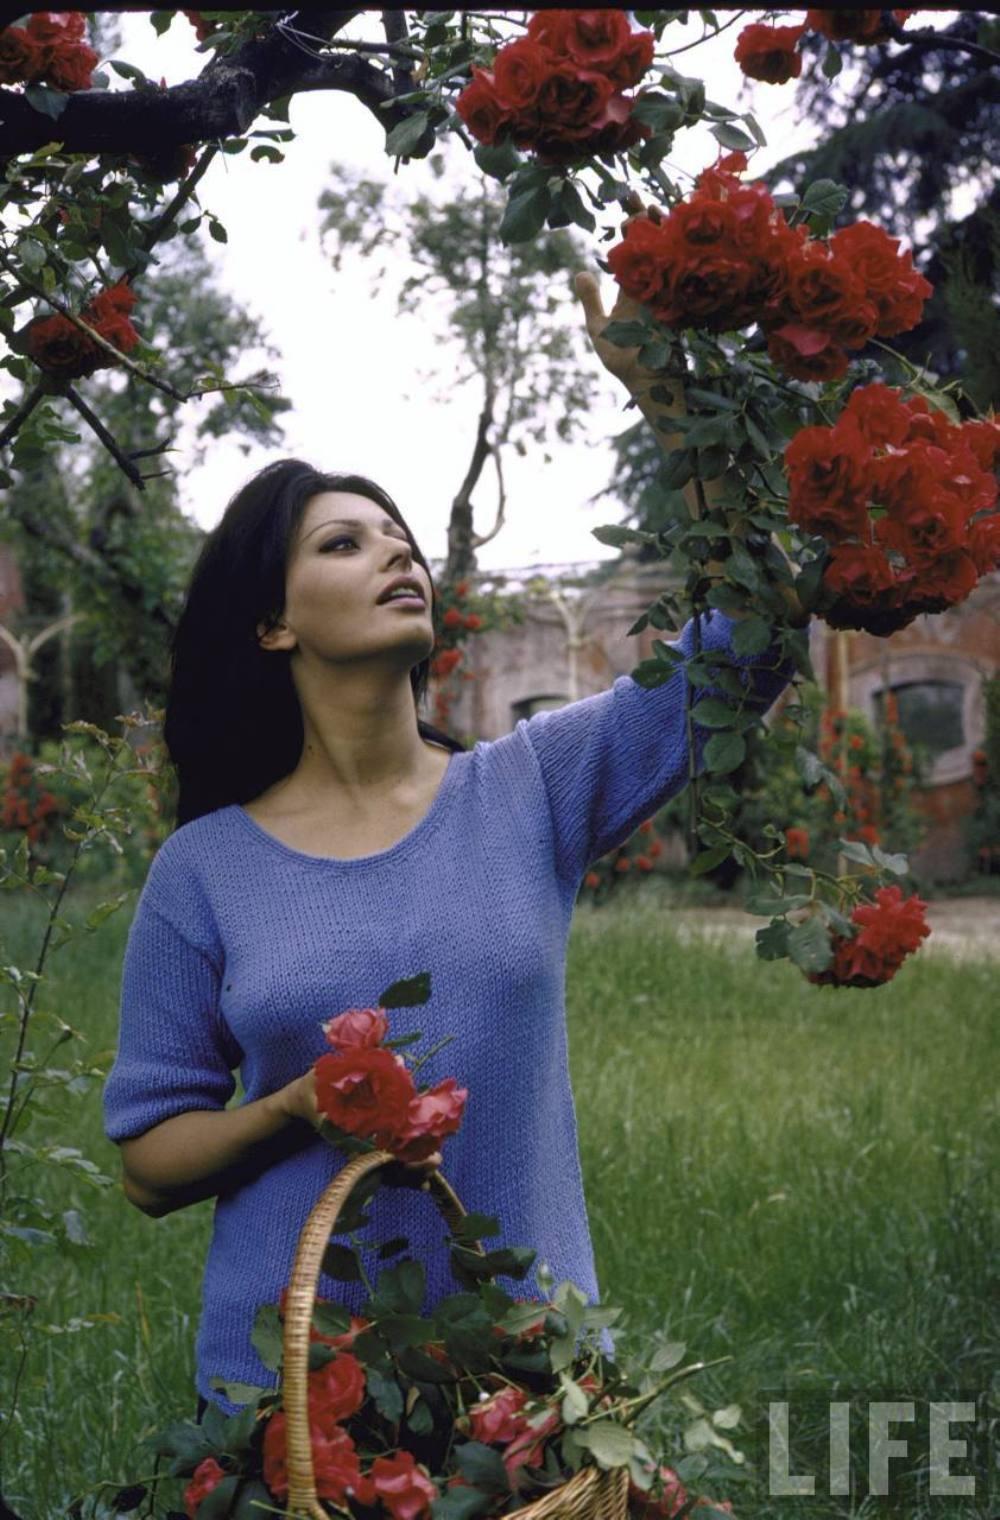 Картинки по запросу журнала Life редкие снимки софи лорен